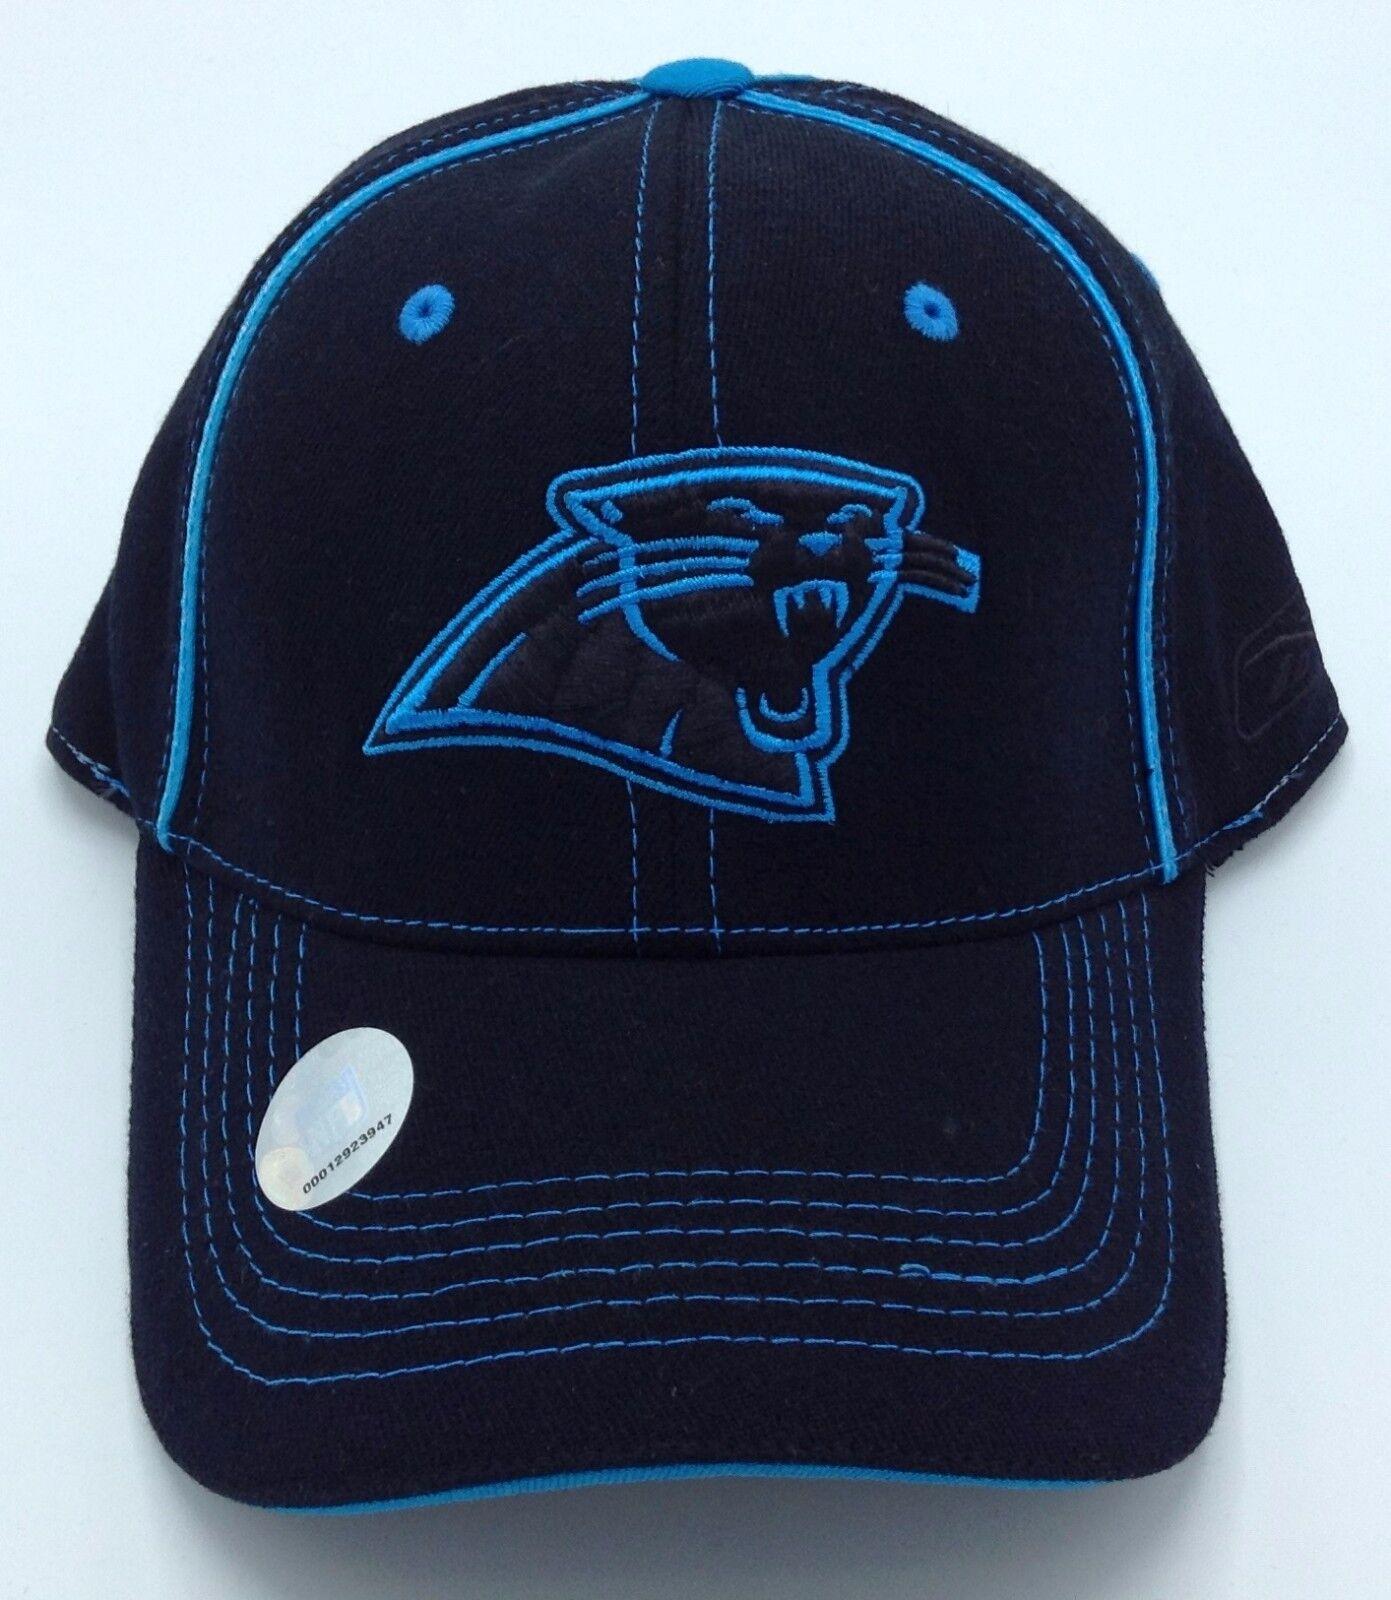 NFL Carolina Panthers Reebok Adulto Estructurado Elástico Curvo Ala Cap New